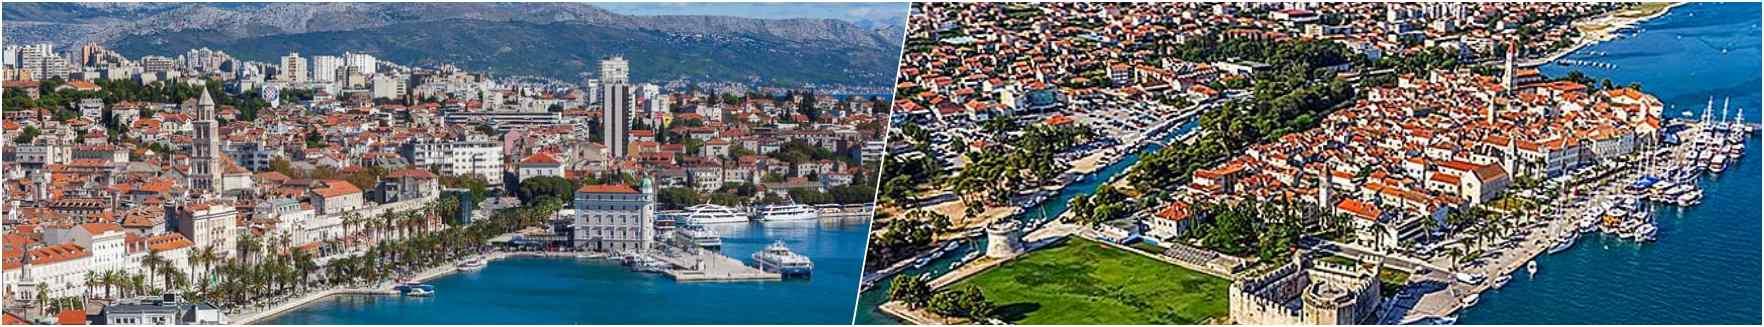 Split - Trogir